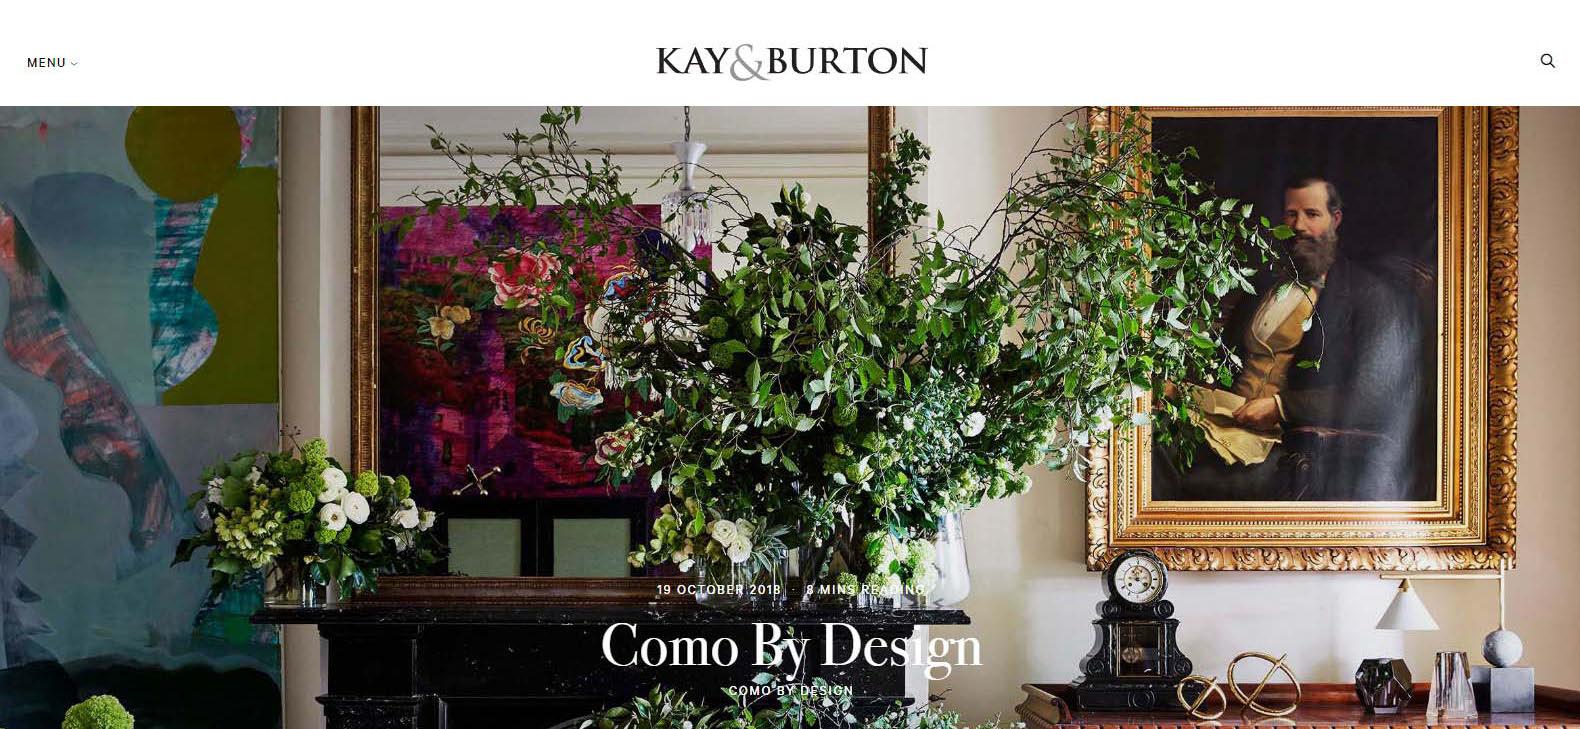 Kay & Burton Branded Image.jpg